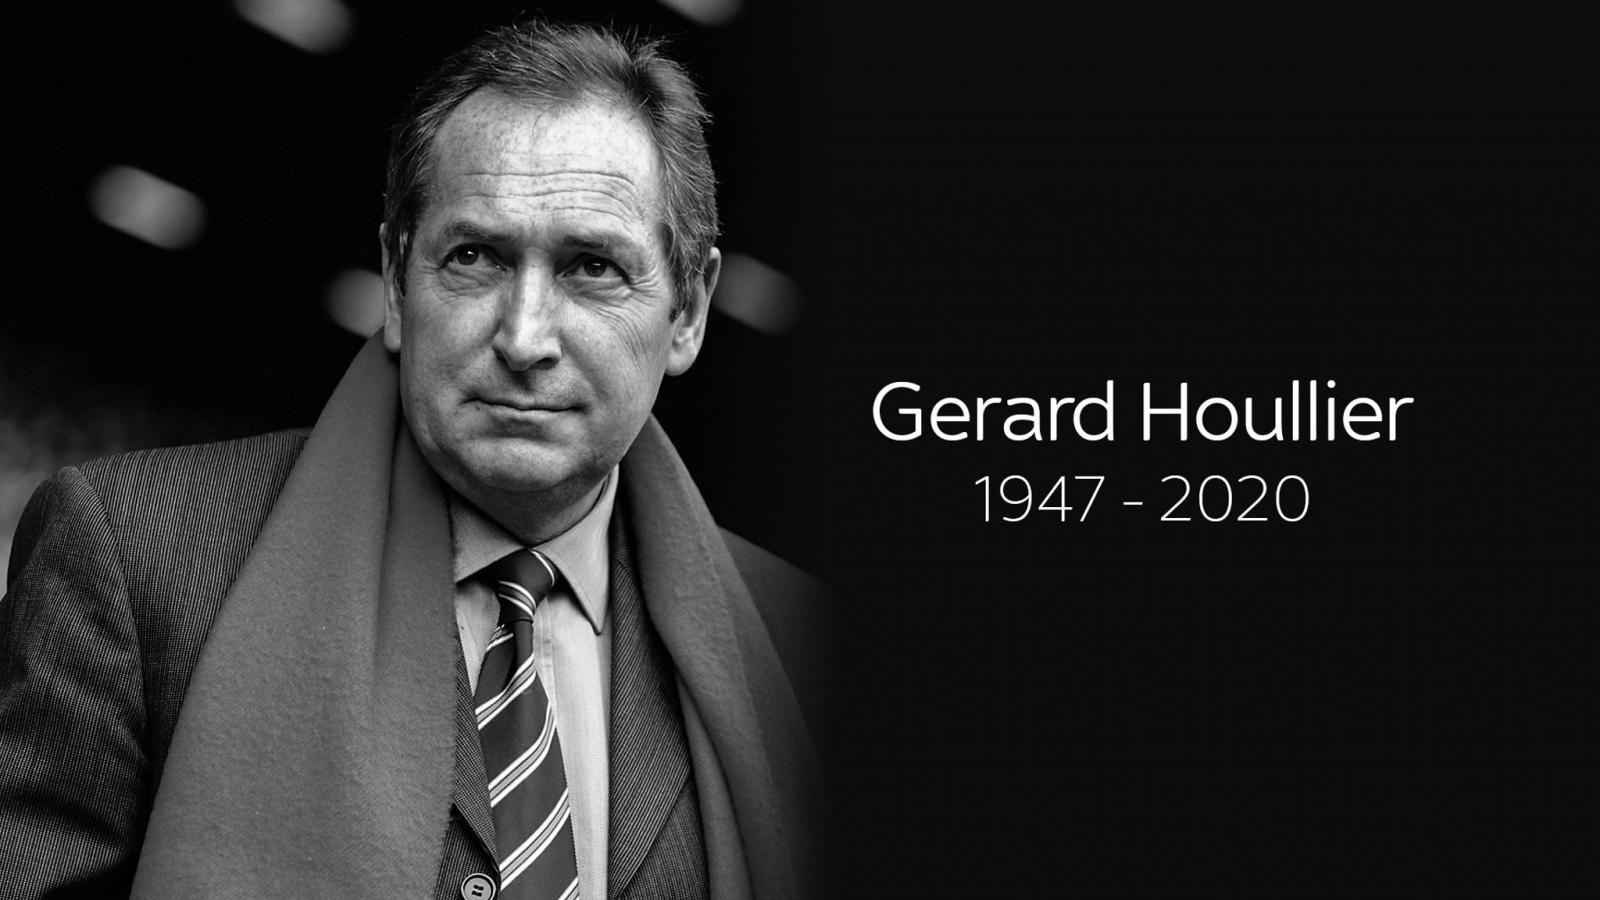 Huyền thoại Liverpool Gerard Houllier qua đời ở tuổi 73